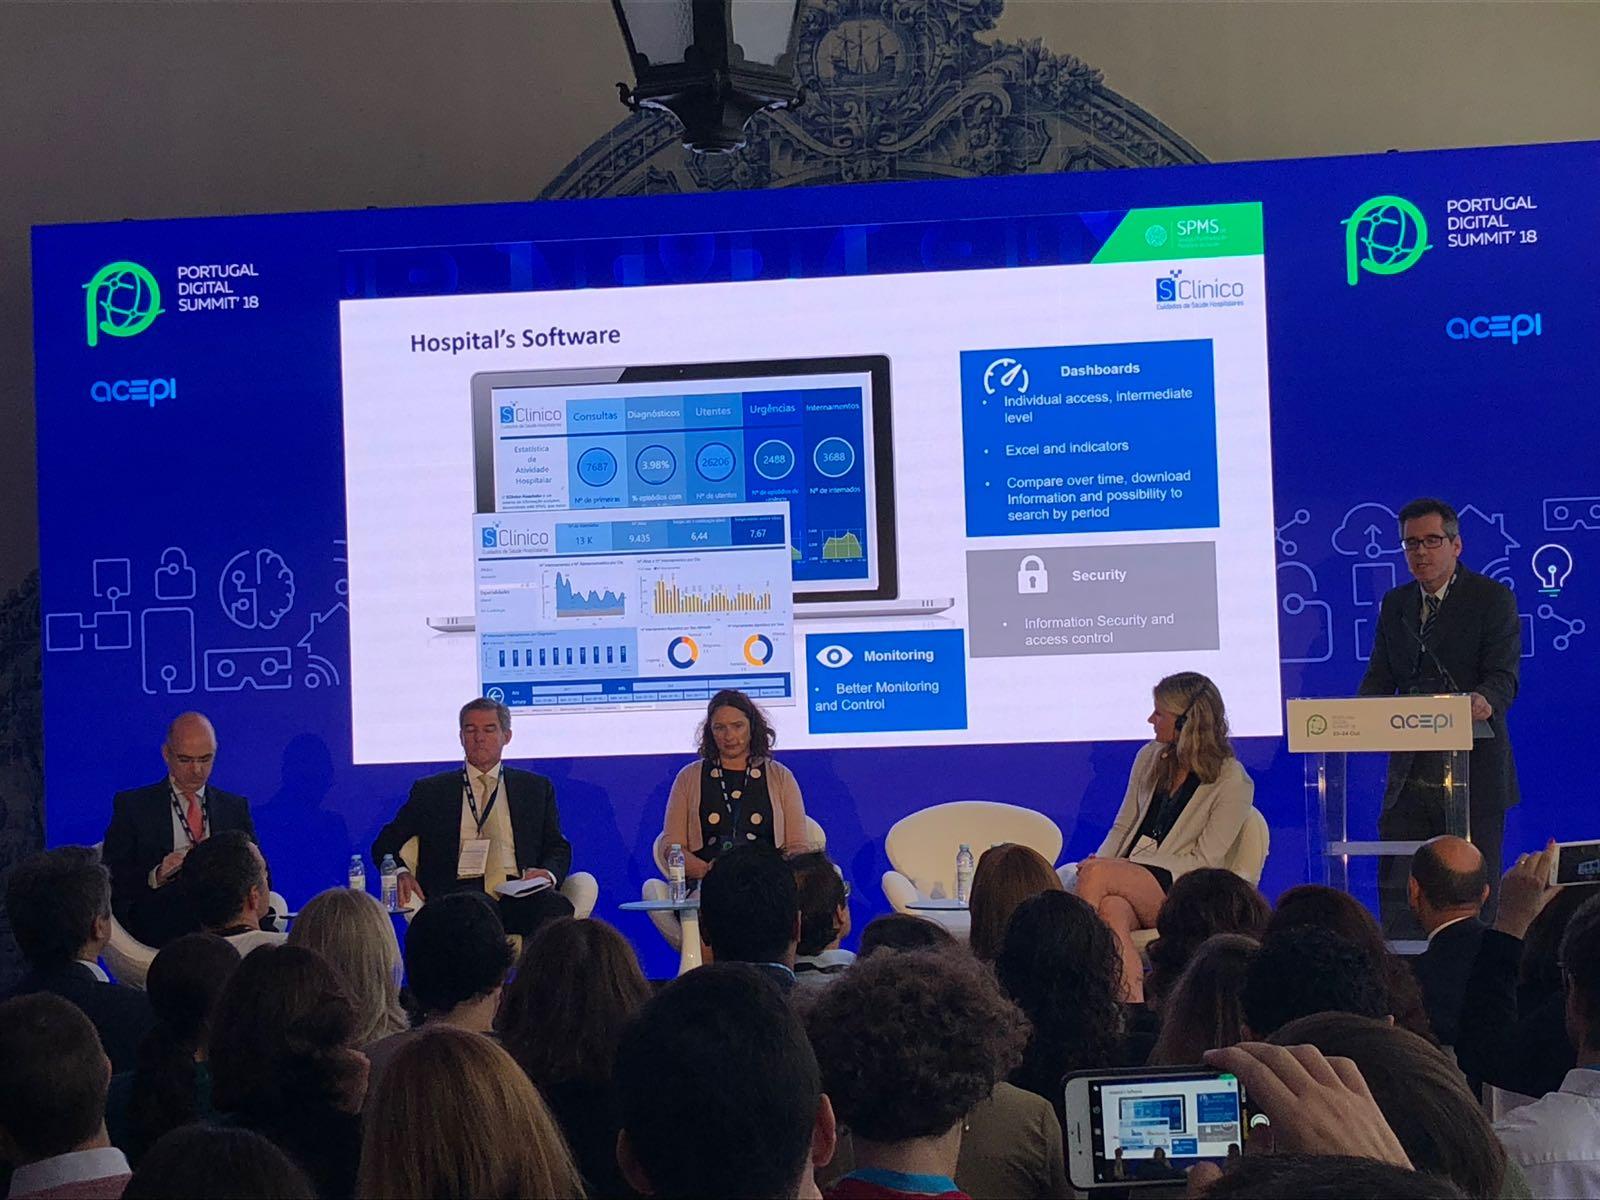 portugal-digital-summit-2018a